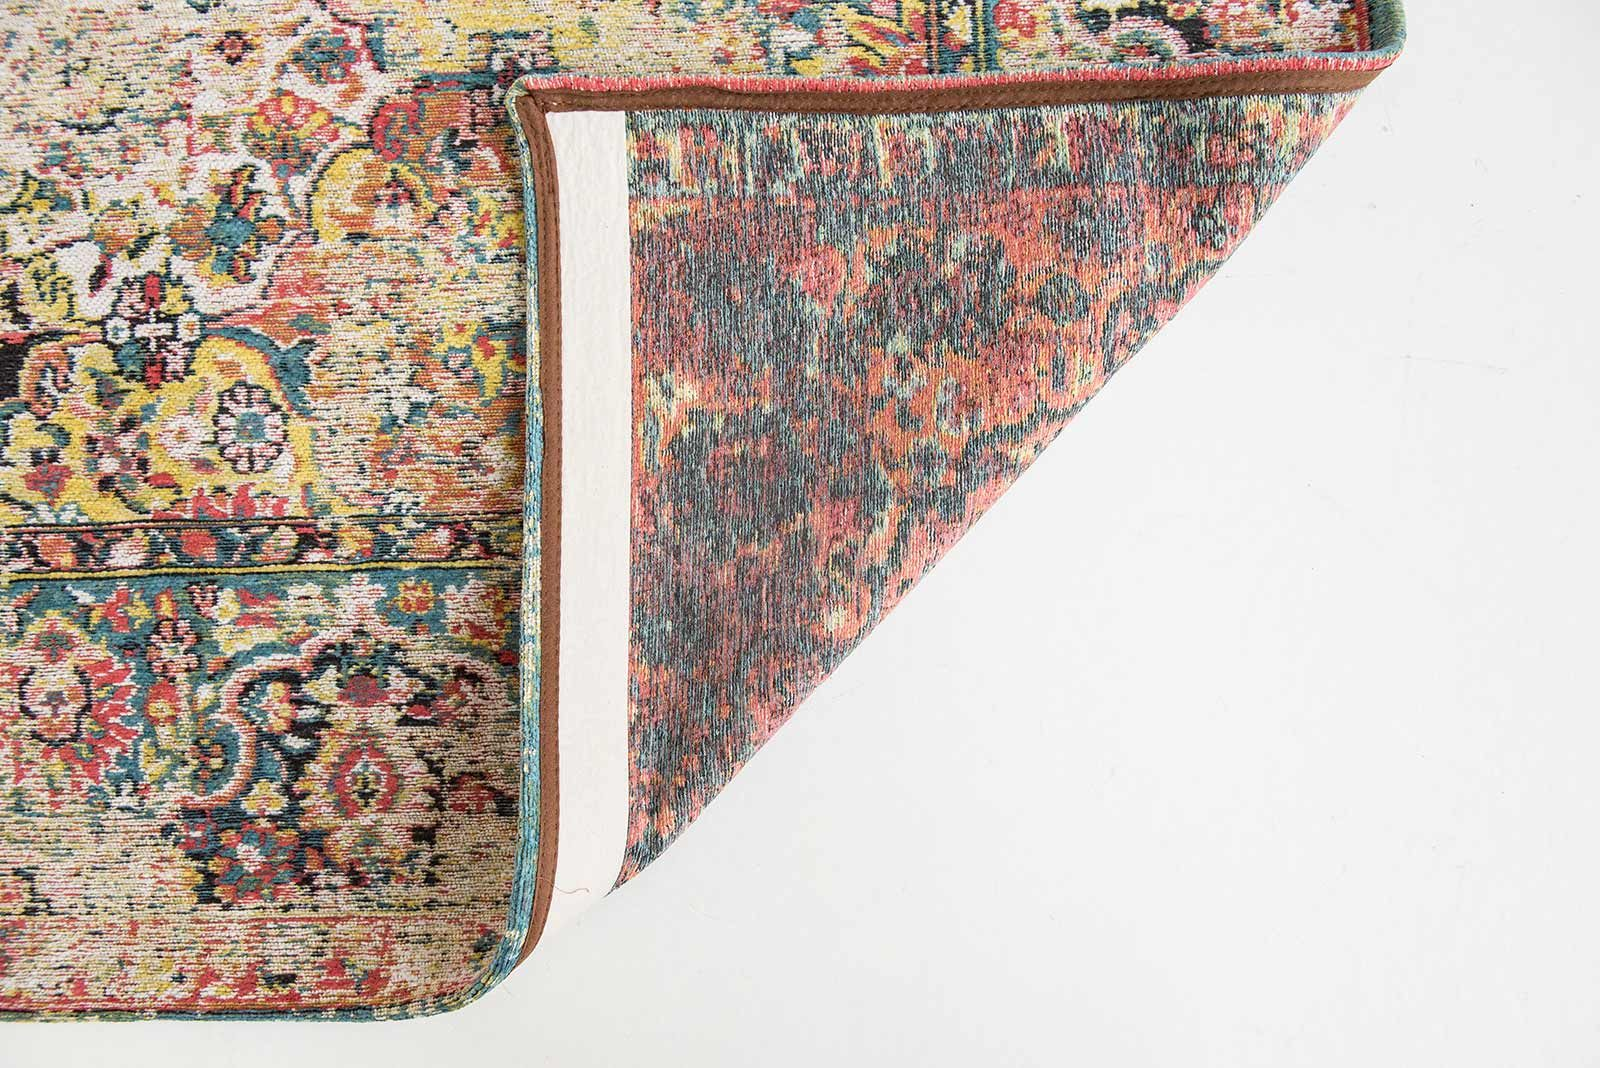 rugs Louis De Poortere LX8712 Antiquarian Antique Bakthiari Janissary Multi back